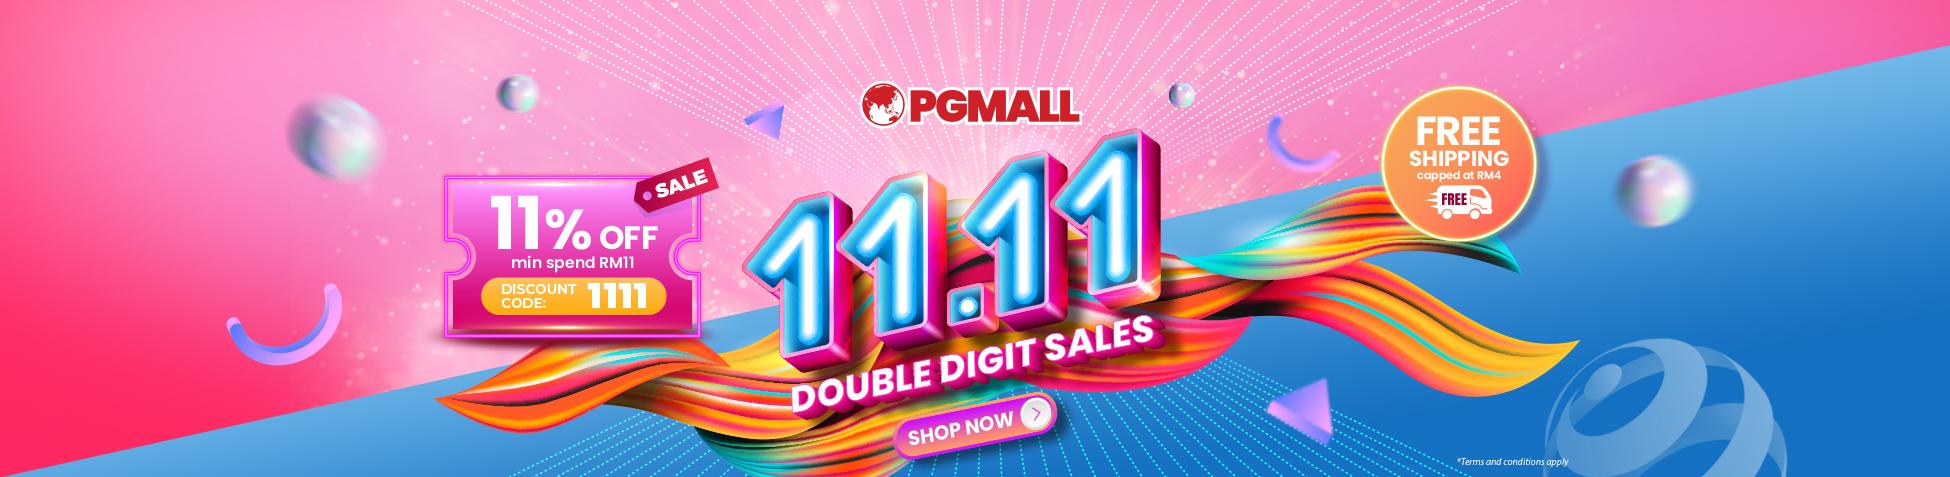 Yeah!! 11.11 Double Digit Sales & Kempen Beli Barangan Malaysia